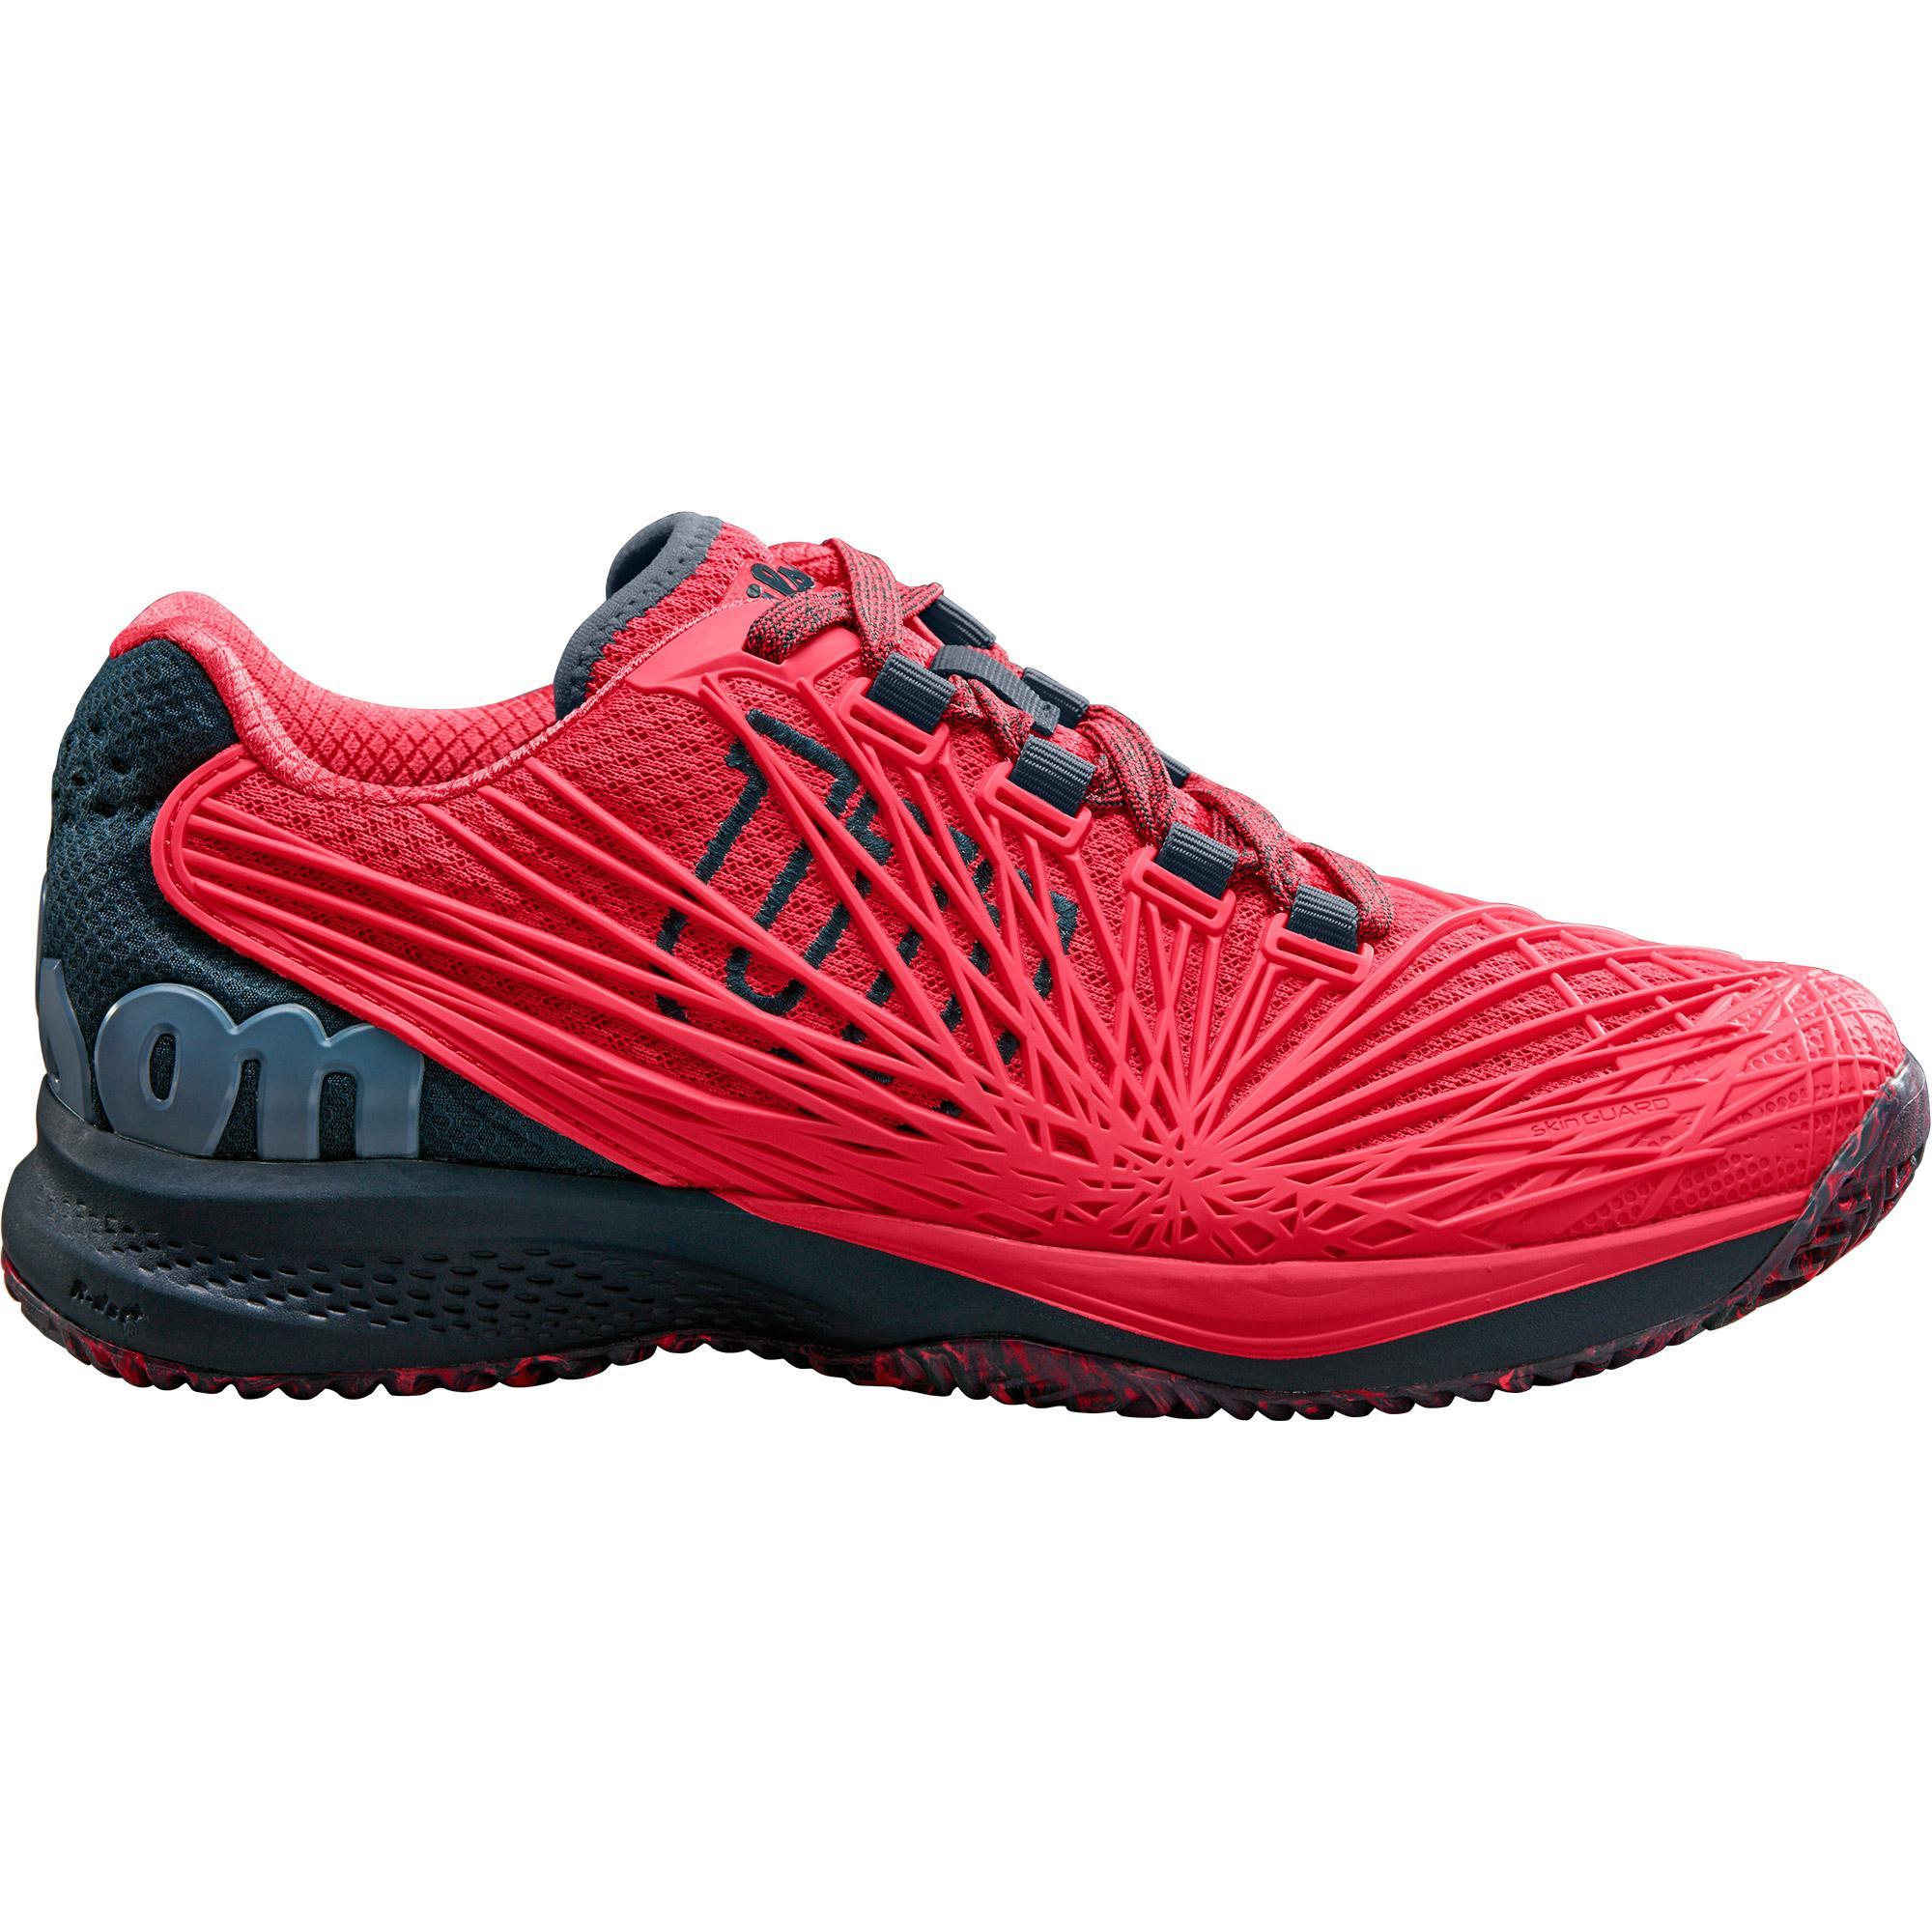 Wilson Womens Kaos 2 Tennis Shoes